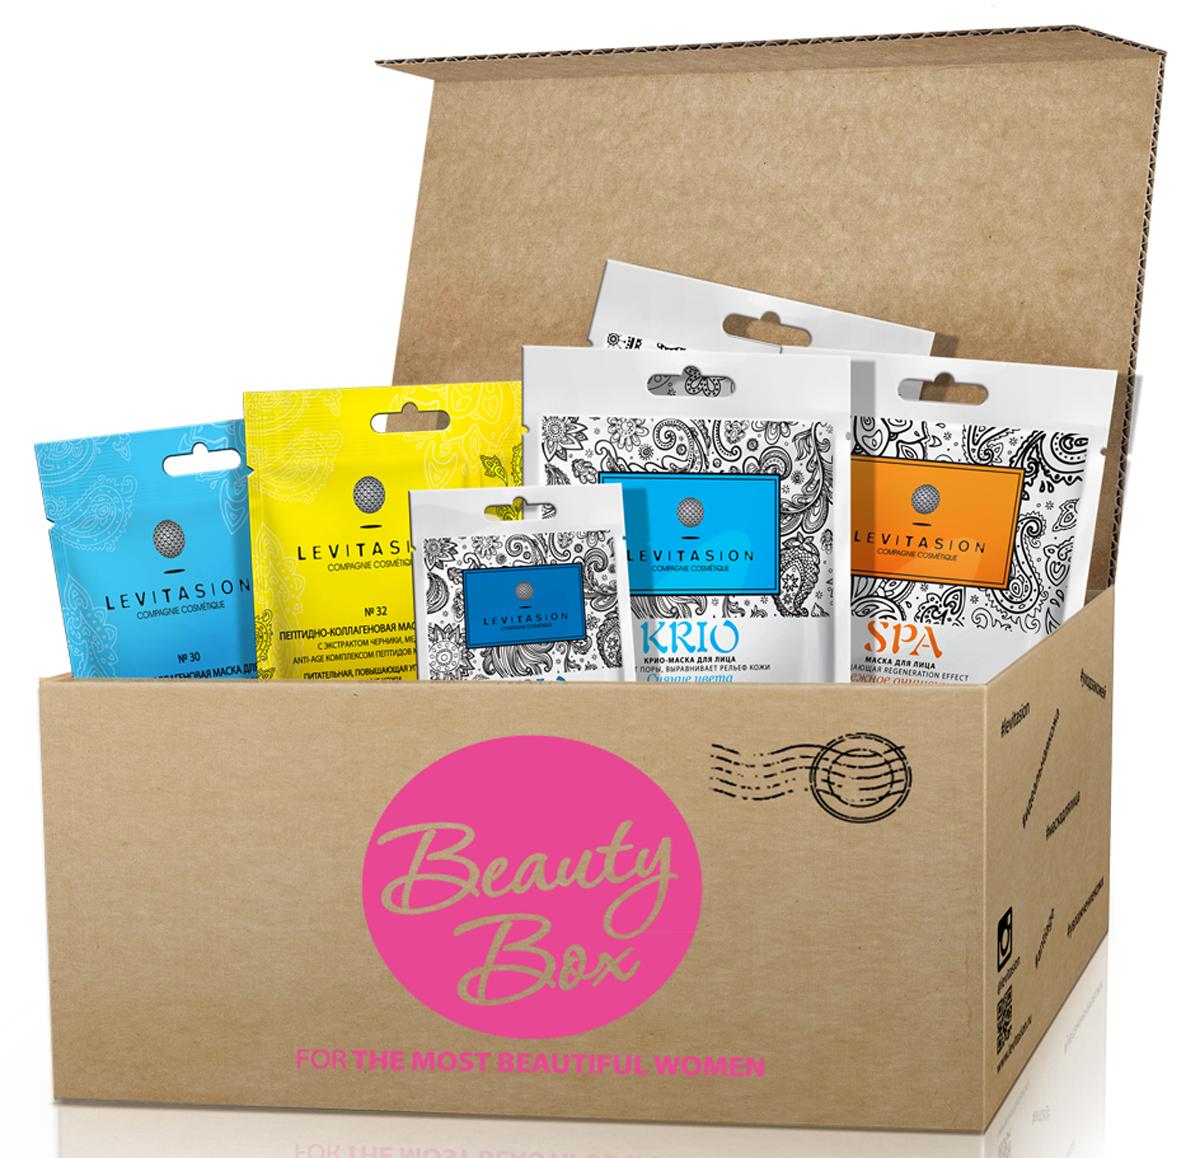 Levitasion Beauty Box MustHave, 290 мл vilenta beauty box musthave 450 мл